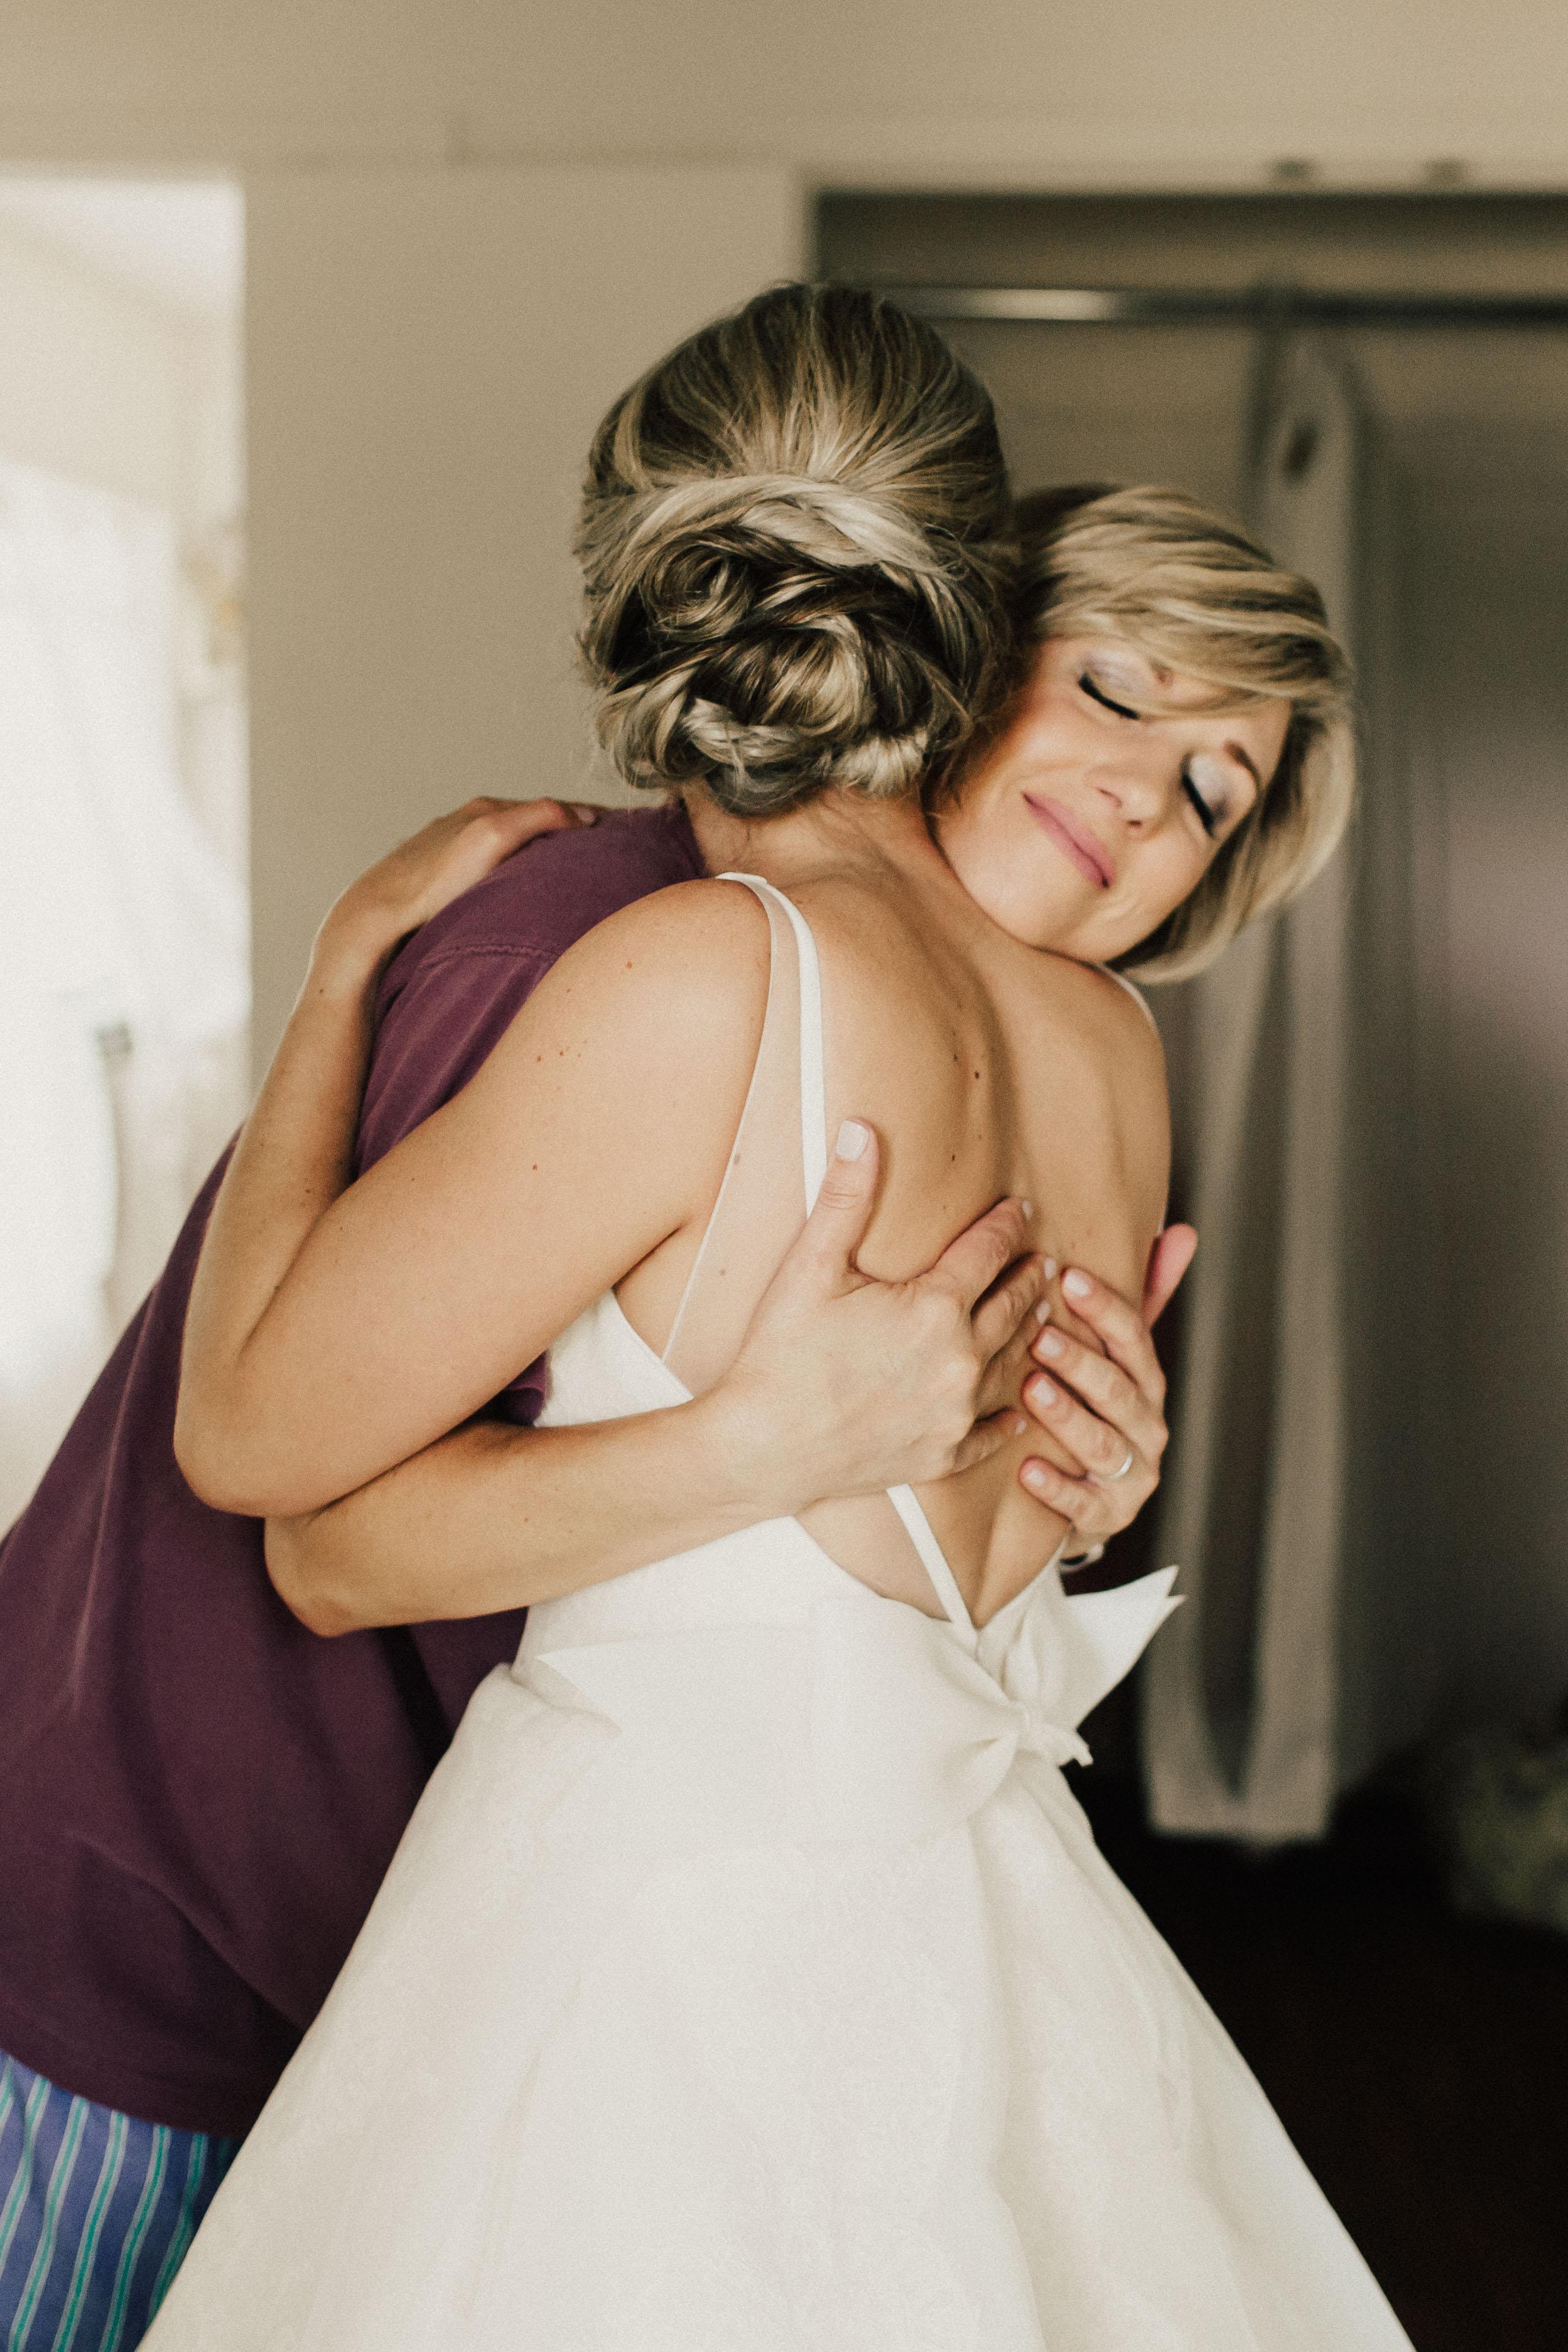 lauren-harrison-wedding-photographer-pecan-springs-ranch-austin-texas--197.jpg